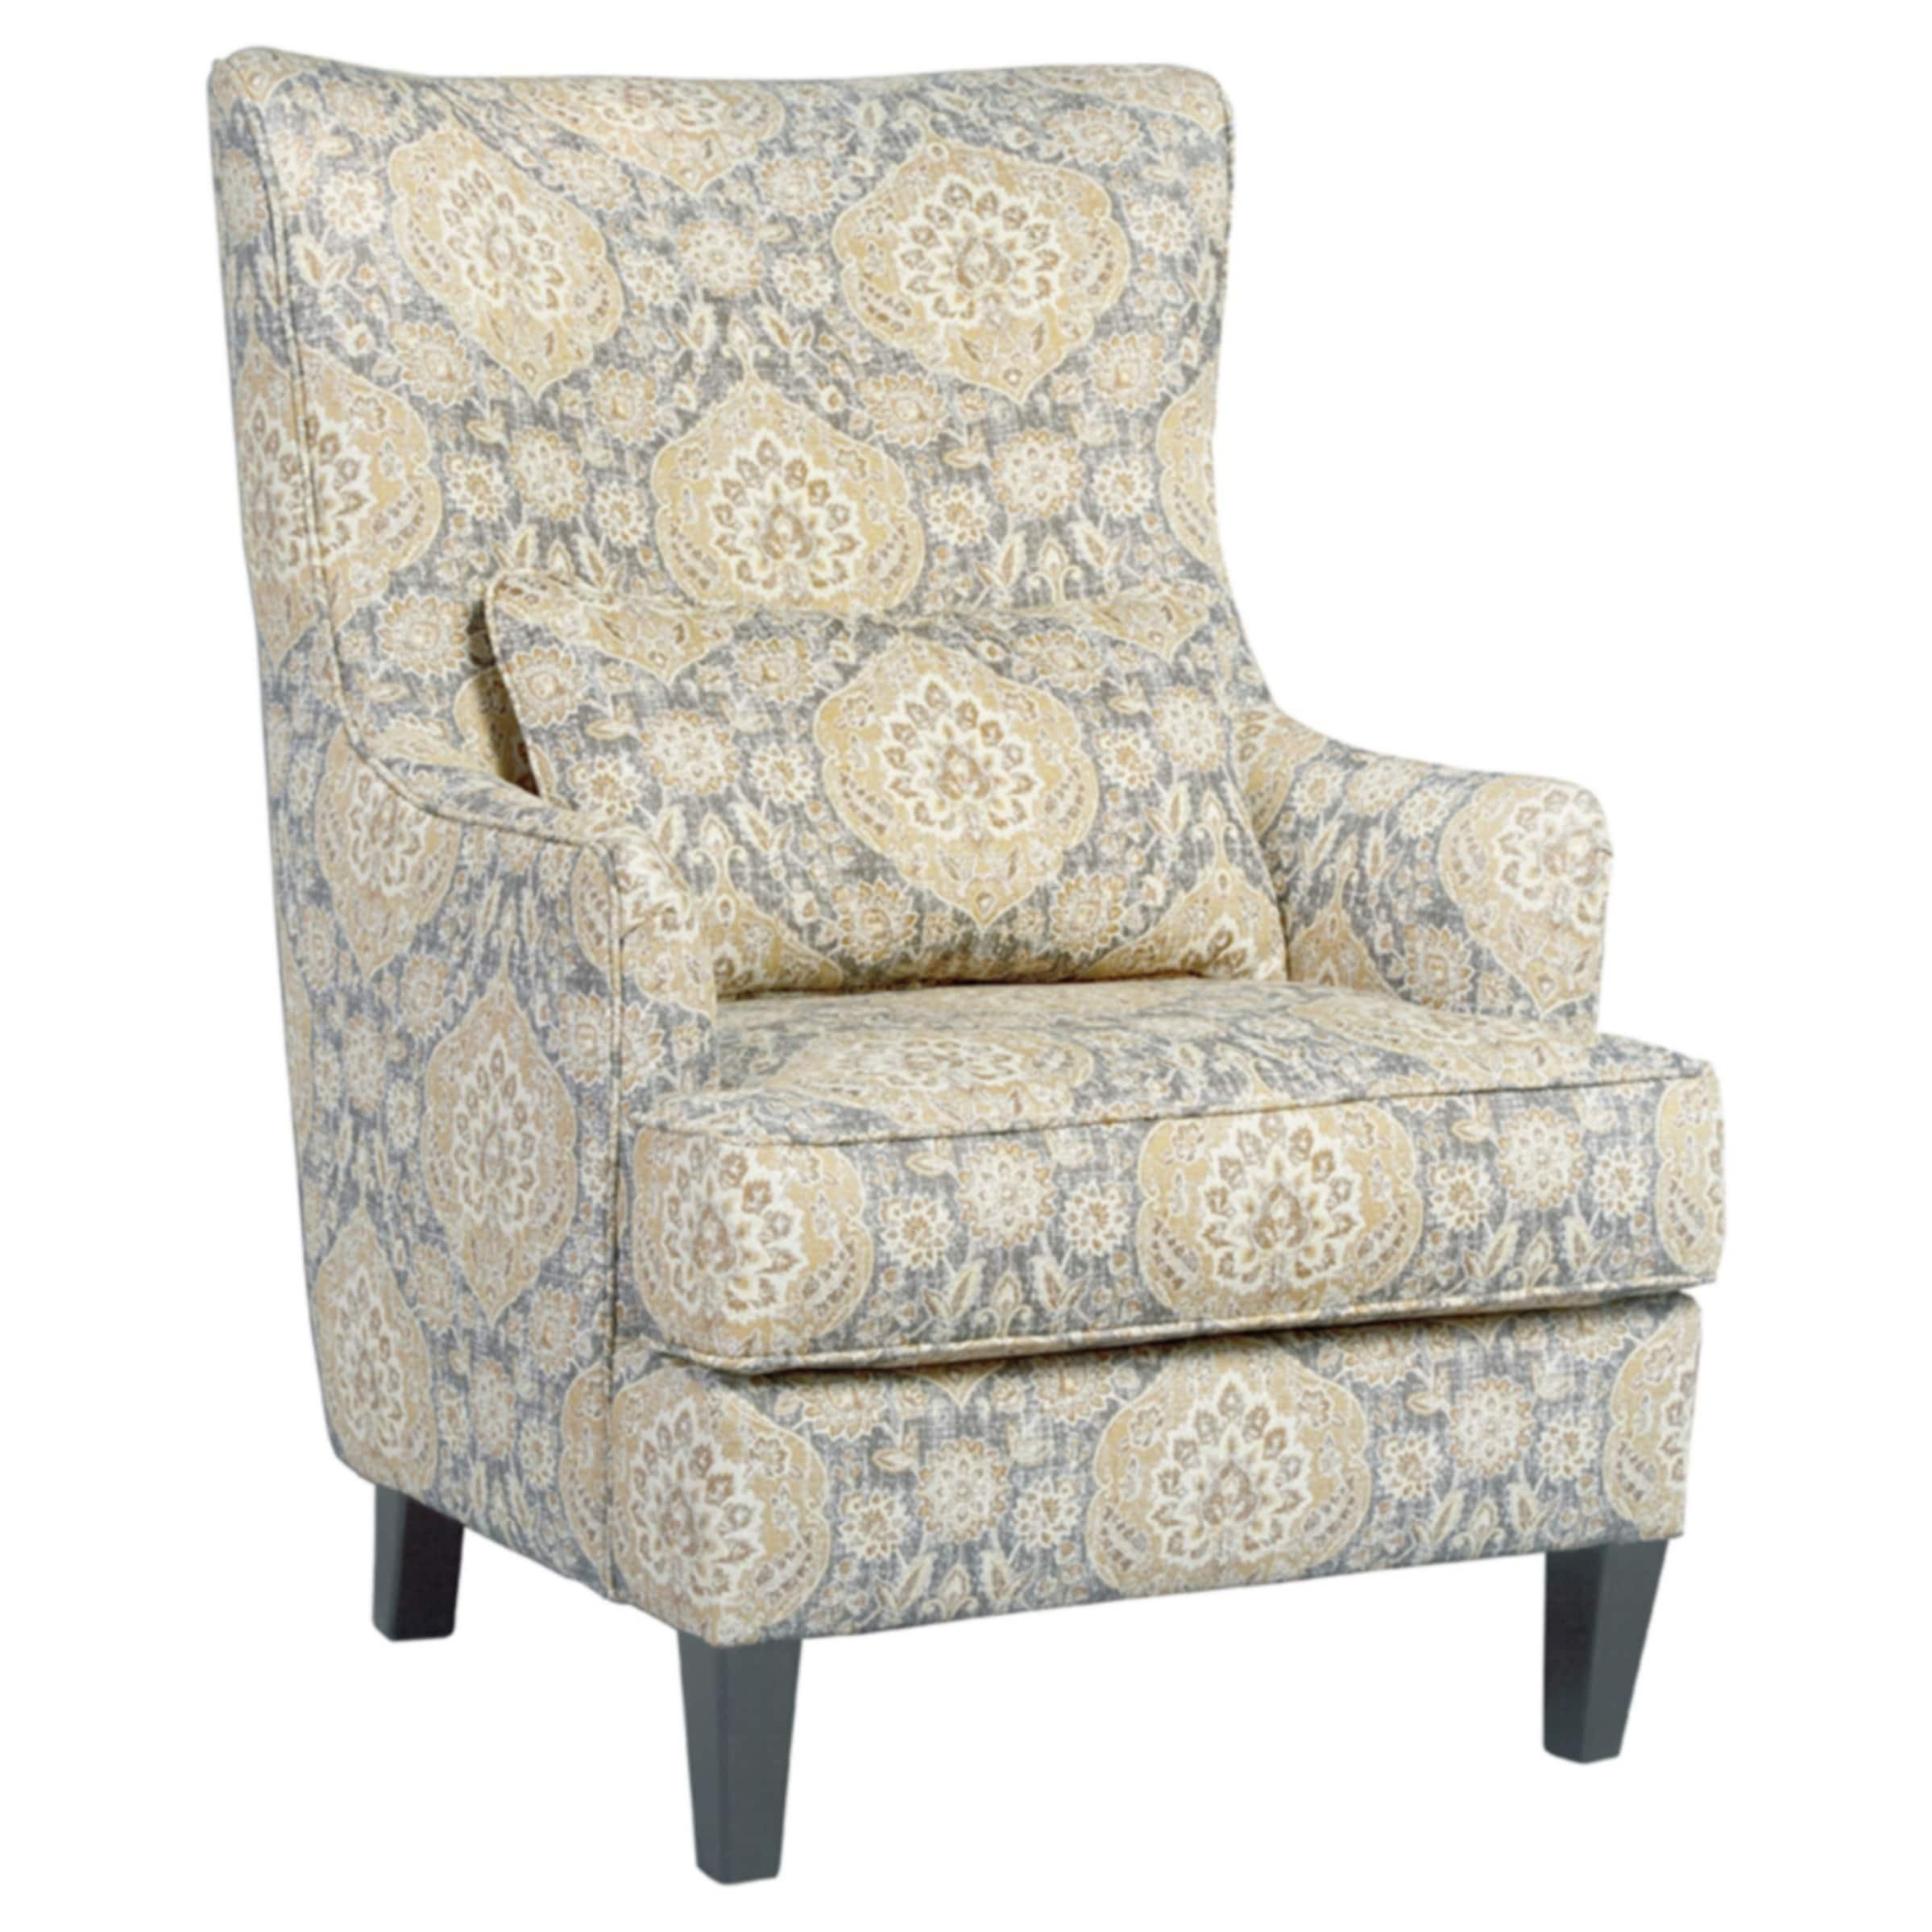 Aramore Cream Jacquard Design Arm Chair